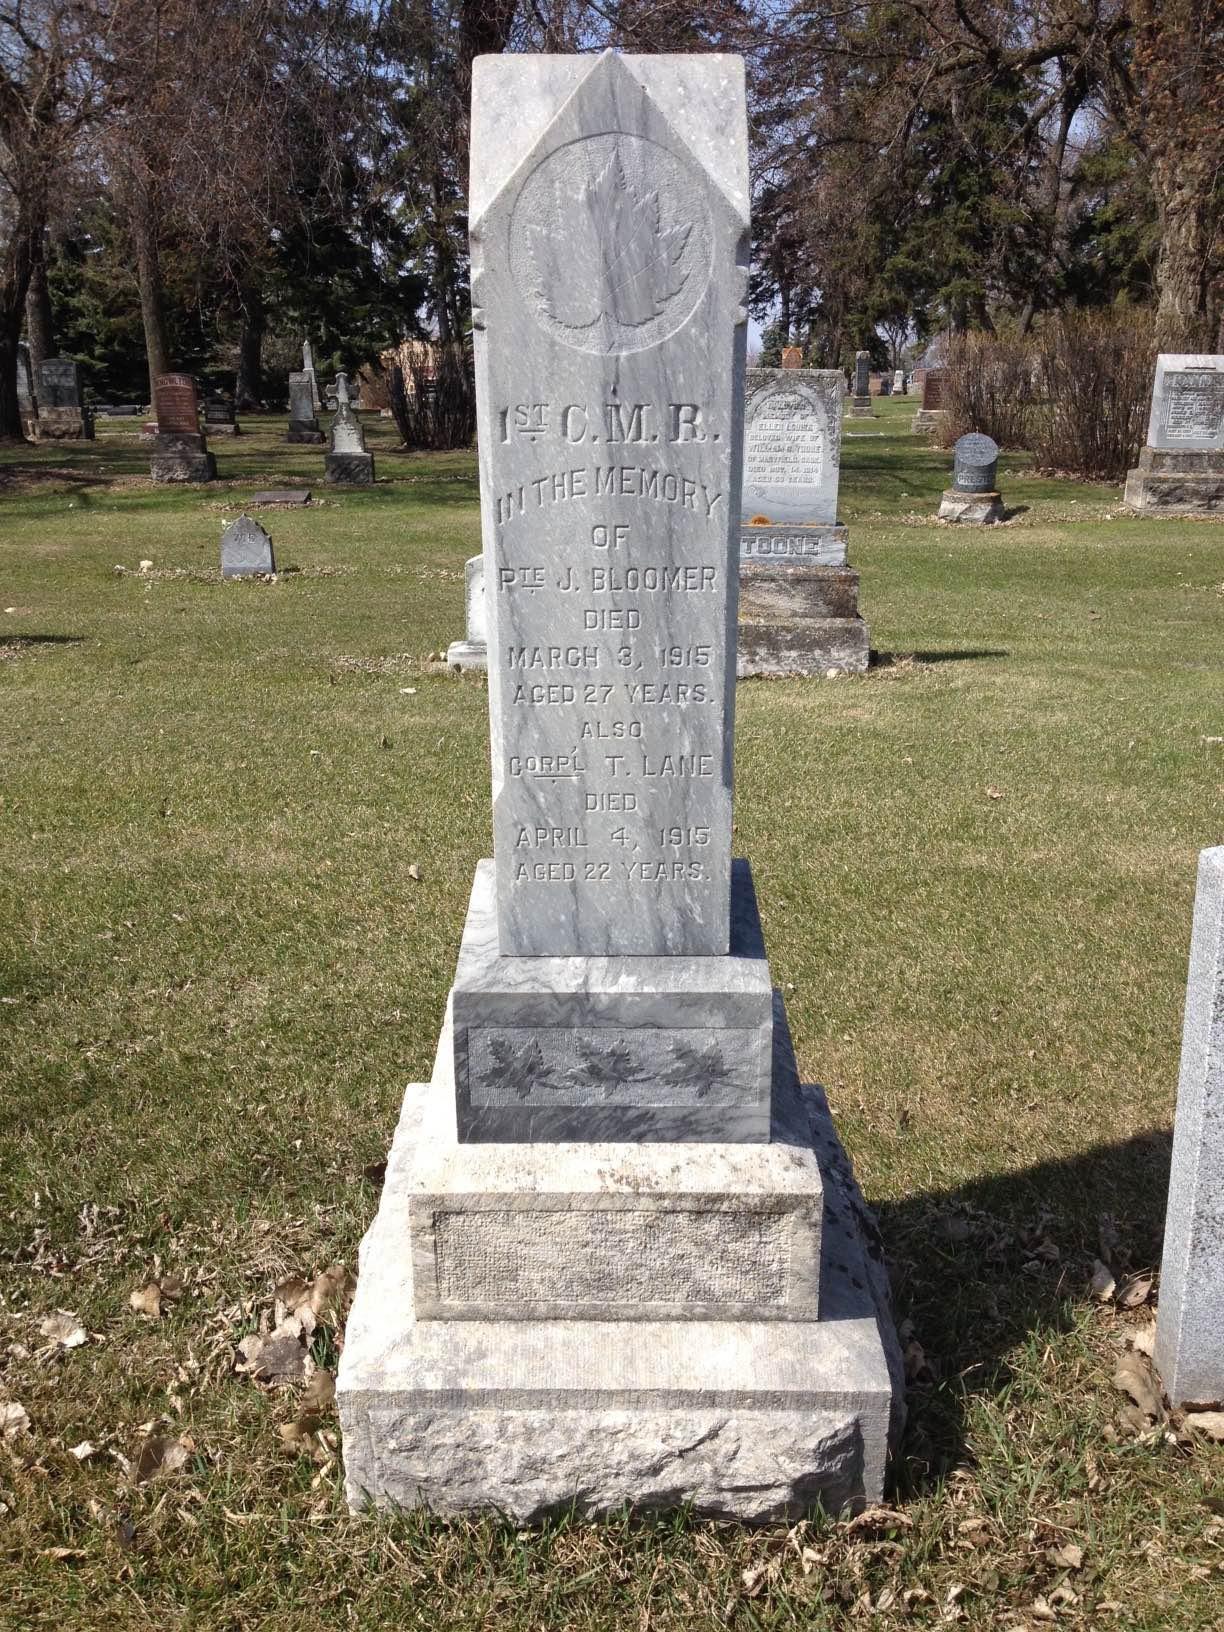 Original Gravemarker– Original grave marker for Pte Bloomer at the Brandon Municipal Cemetery (Brandon, MB, Canada), Section 16 Block C Plot 24